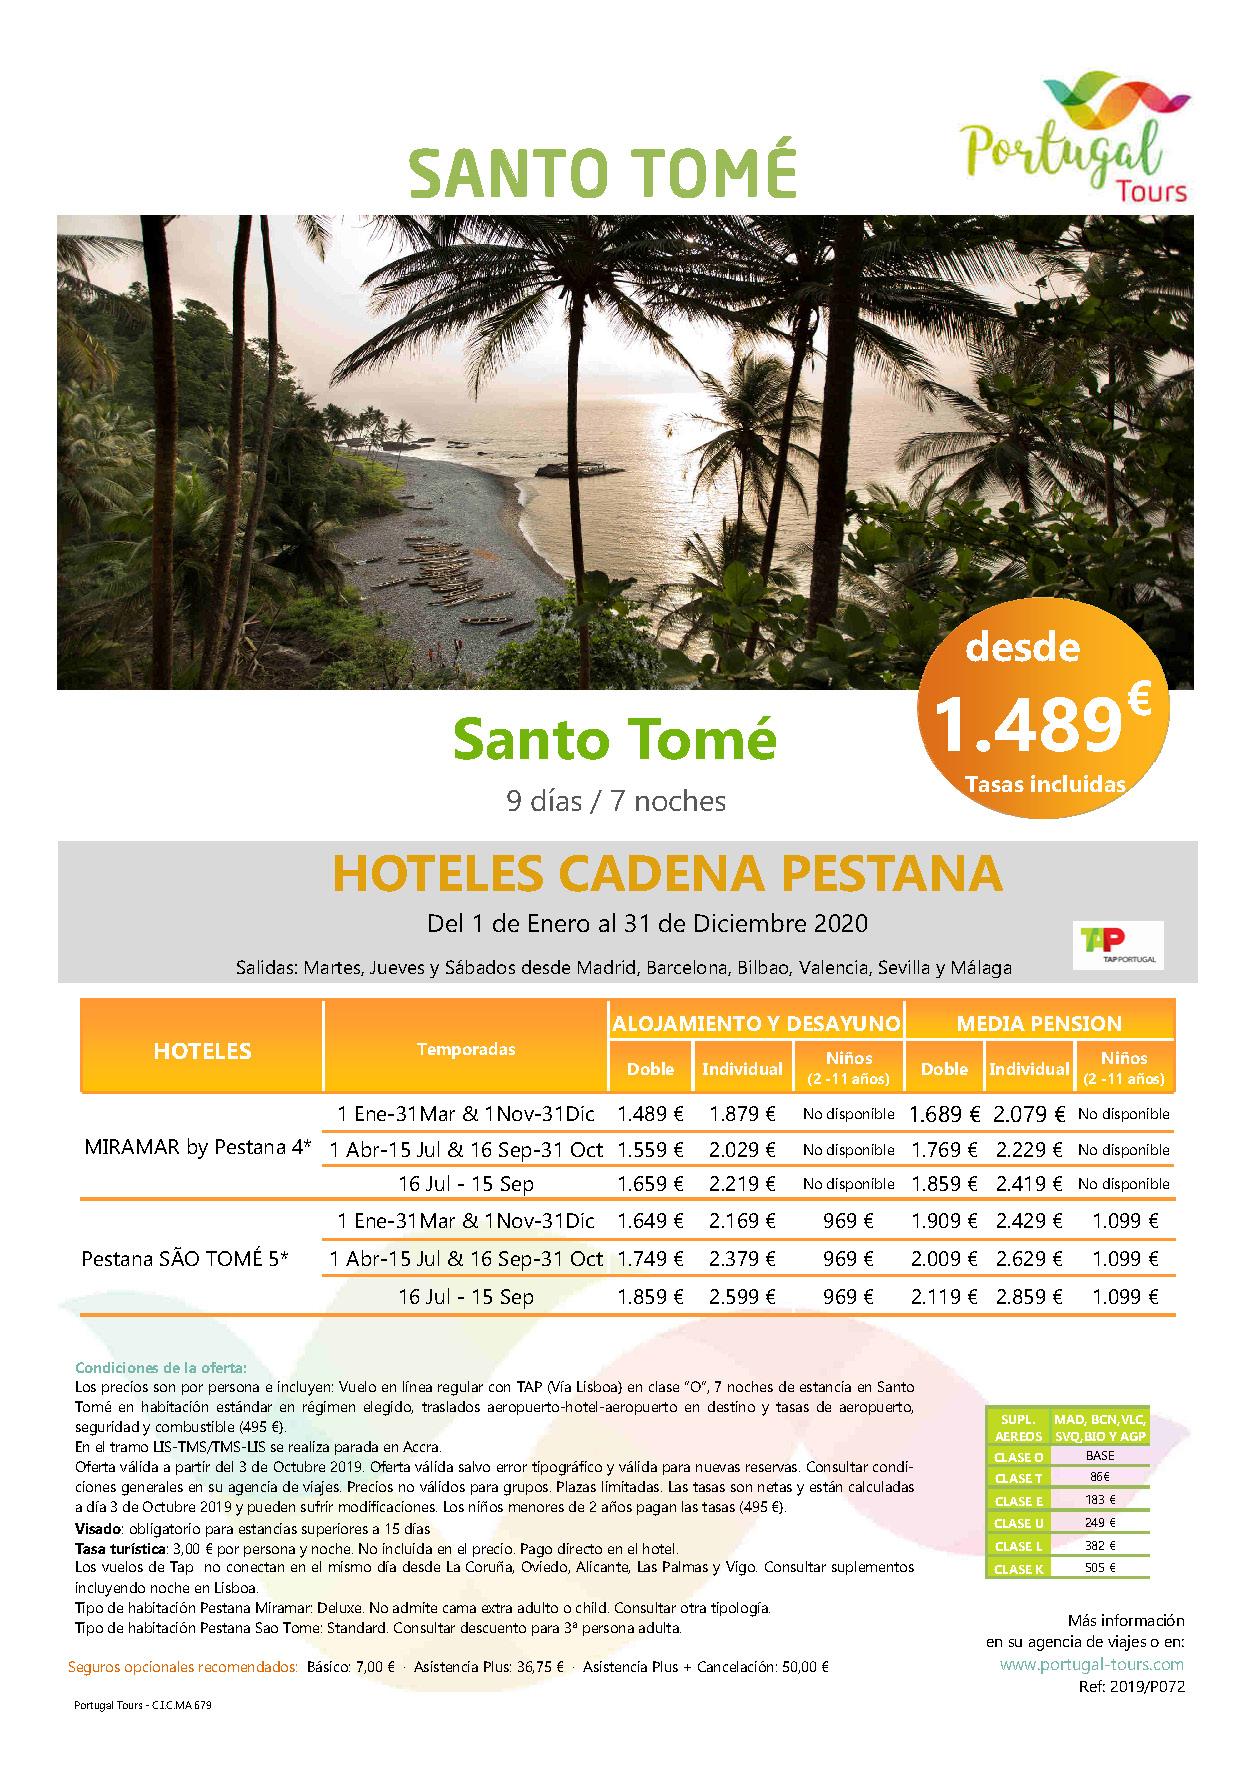 Oferta Portugal Tours Estancias en Santo Tome 2020